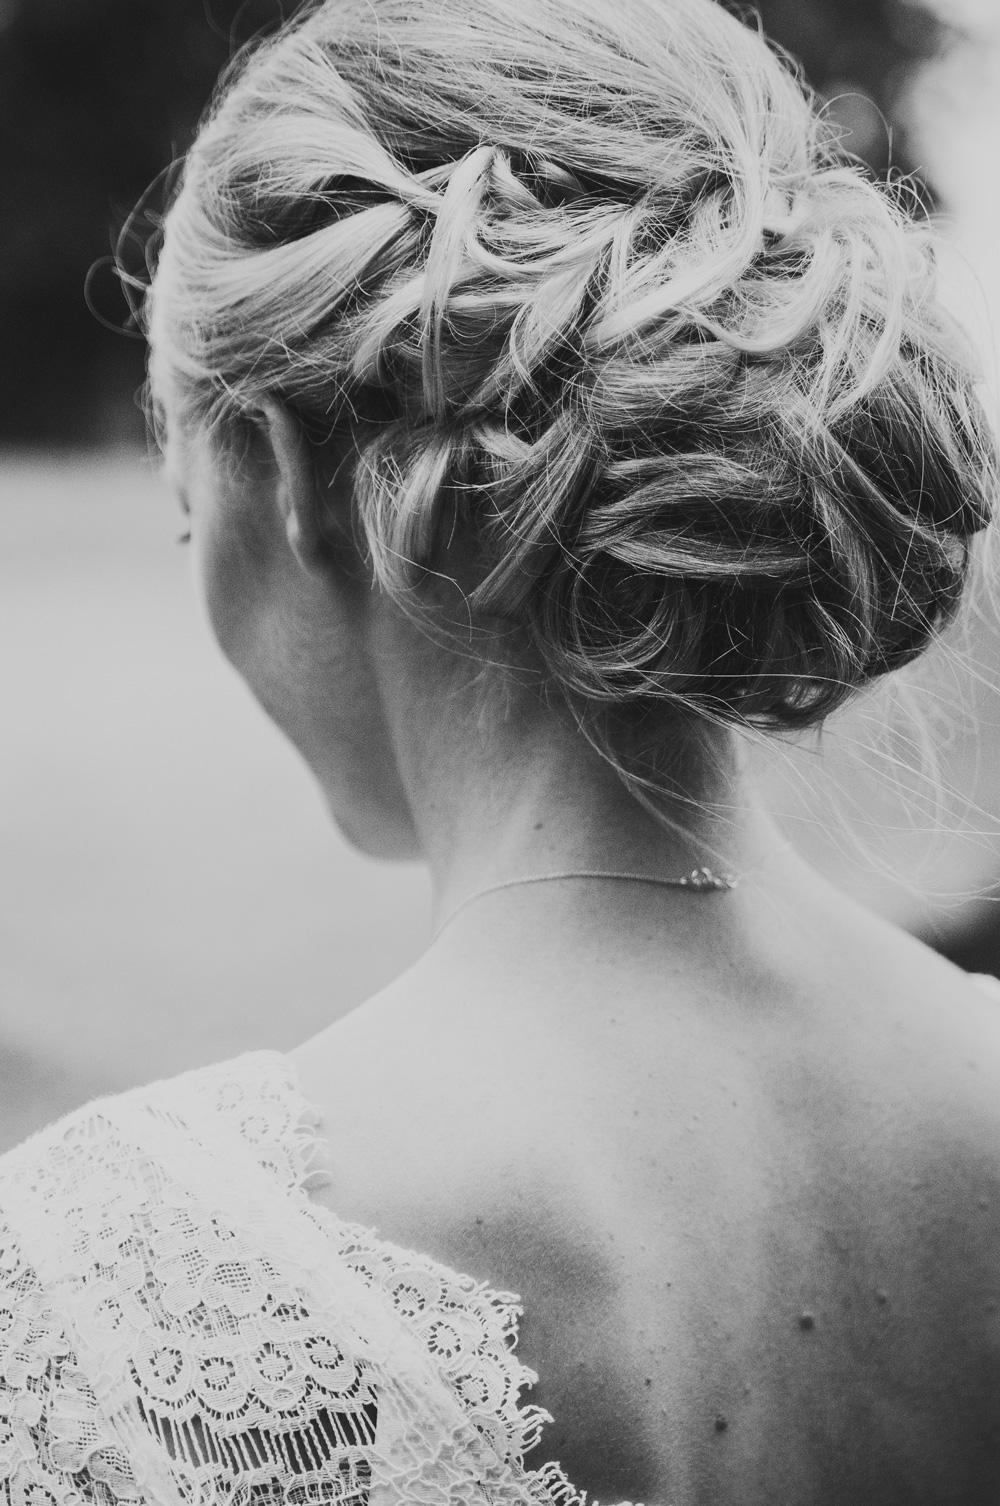 håruppsättning-brud-bröllopsfotografering-torup-bröllopsfotograf-skåne-aase-pouline.jpg